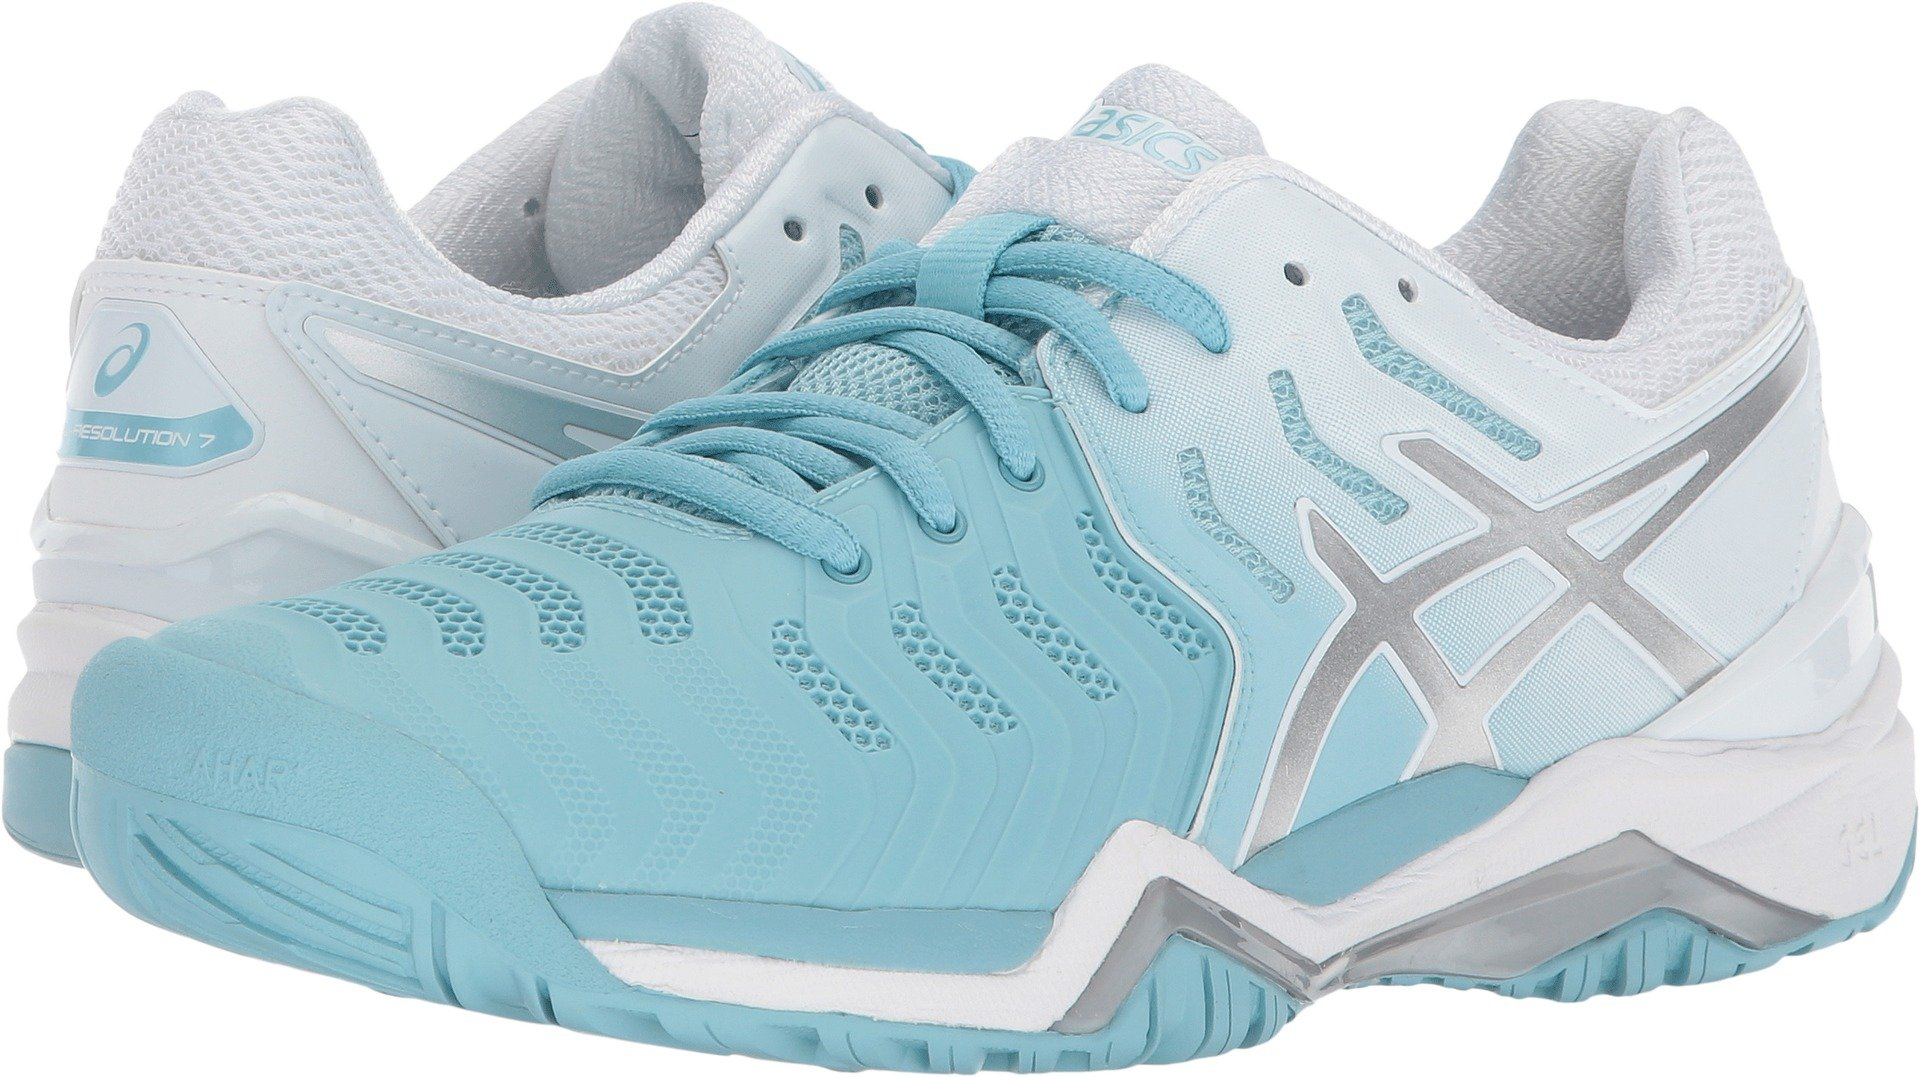 ASICS Womens Gel-Resolution 7 Sneaker, Porcelain Blue/Silver/White, Size 10